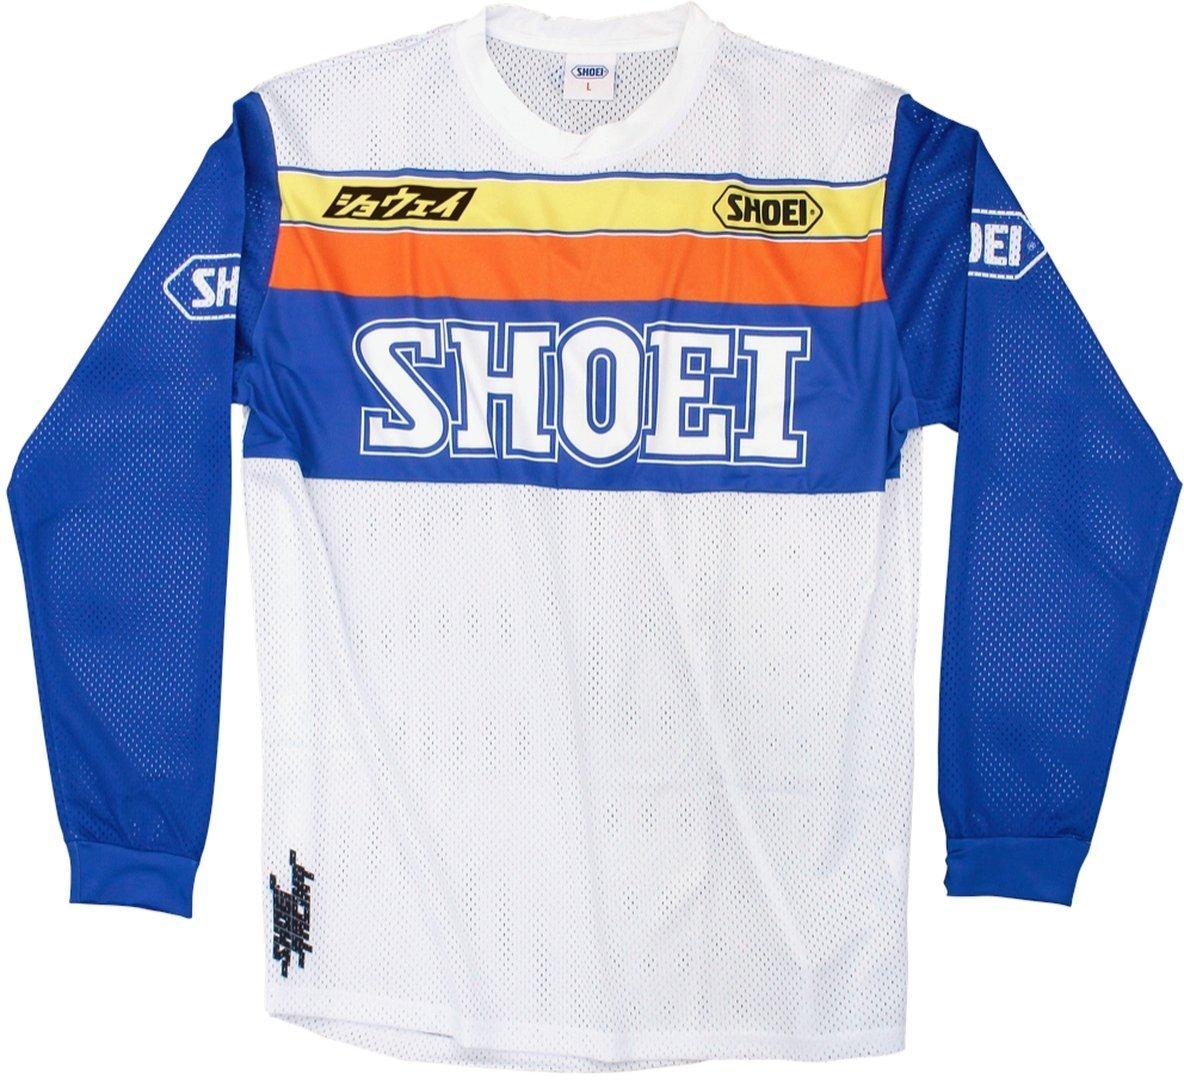 Shoei Equation Motocross Jersey, weiss-blau-orange, Größe L, weiss-blau-orange, Größe L